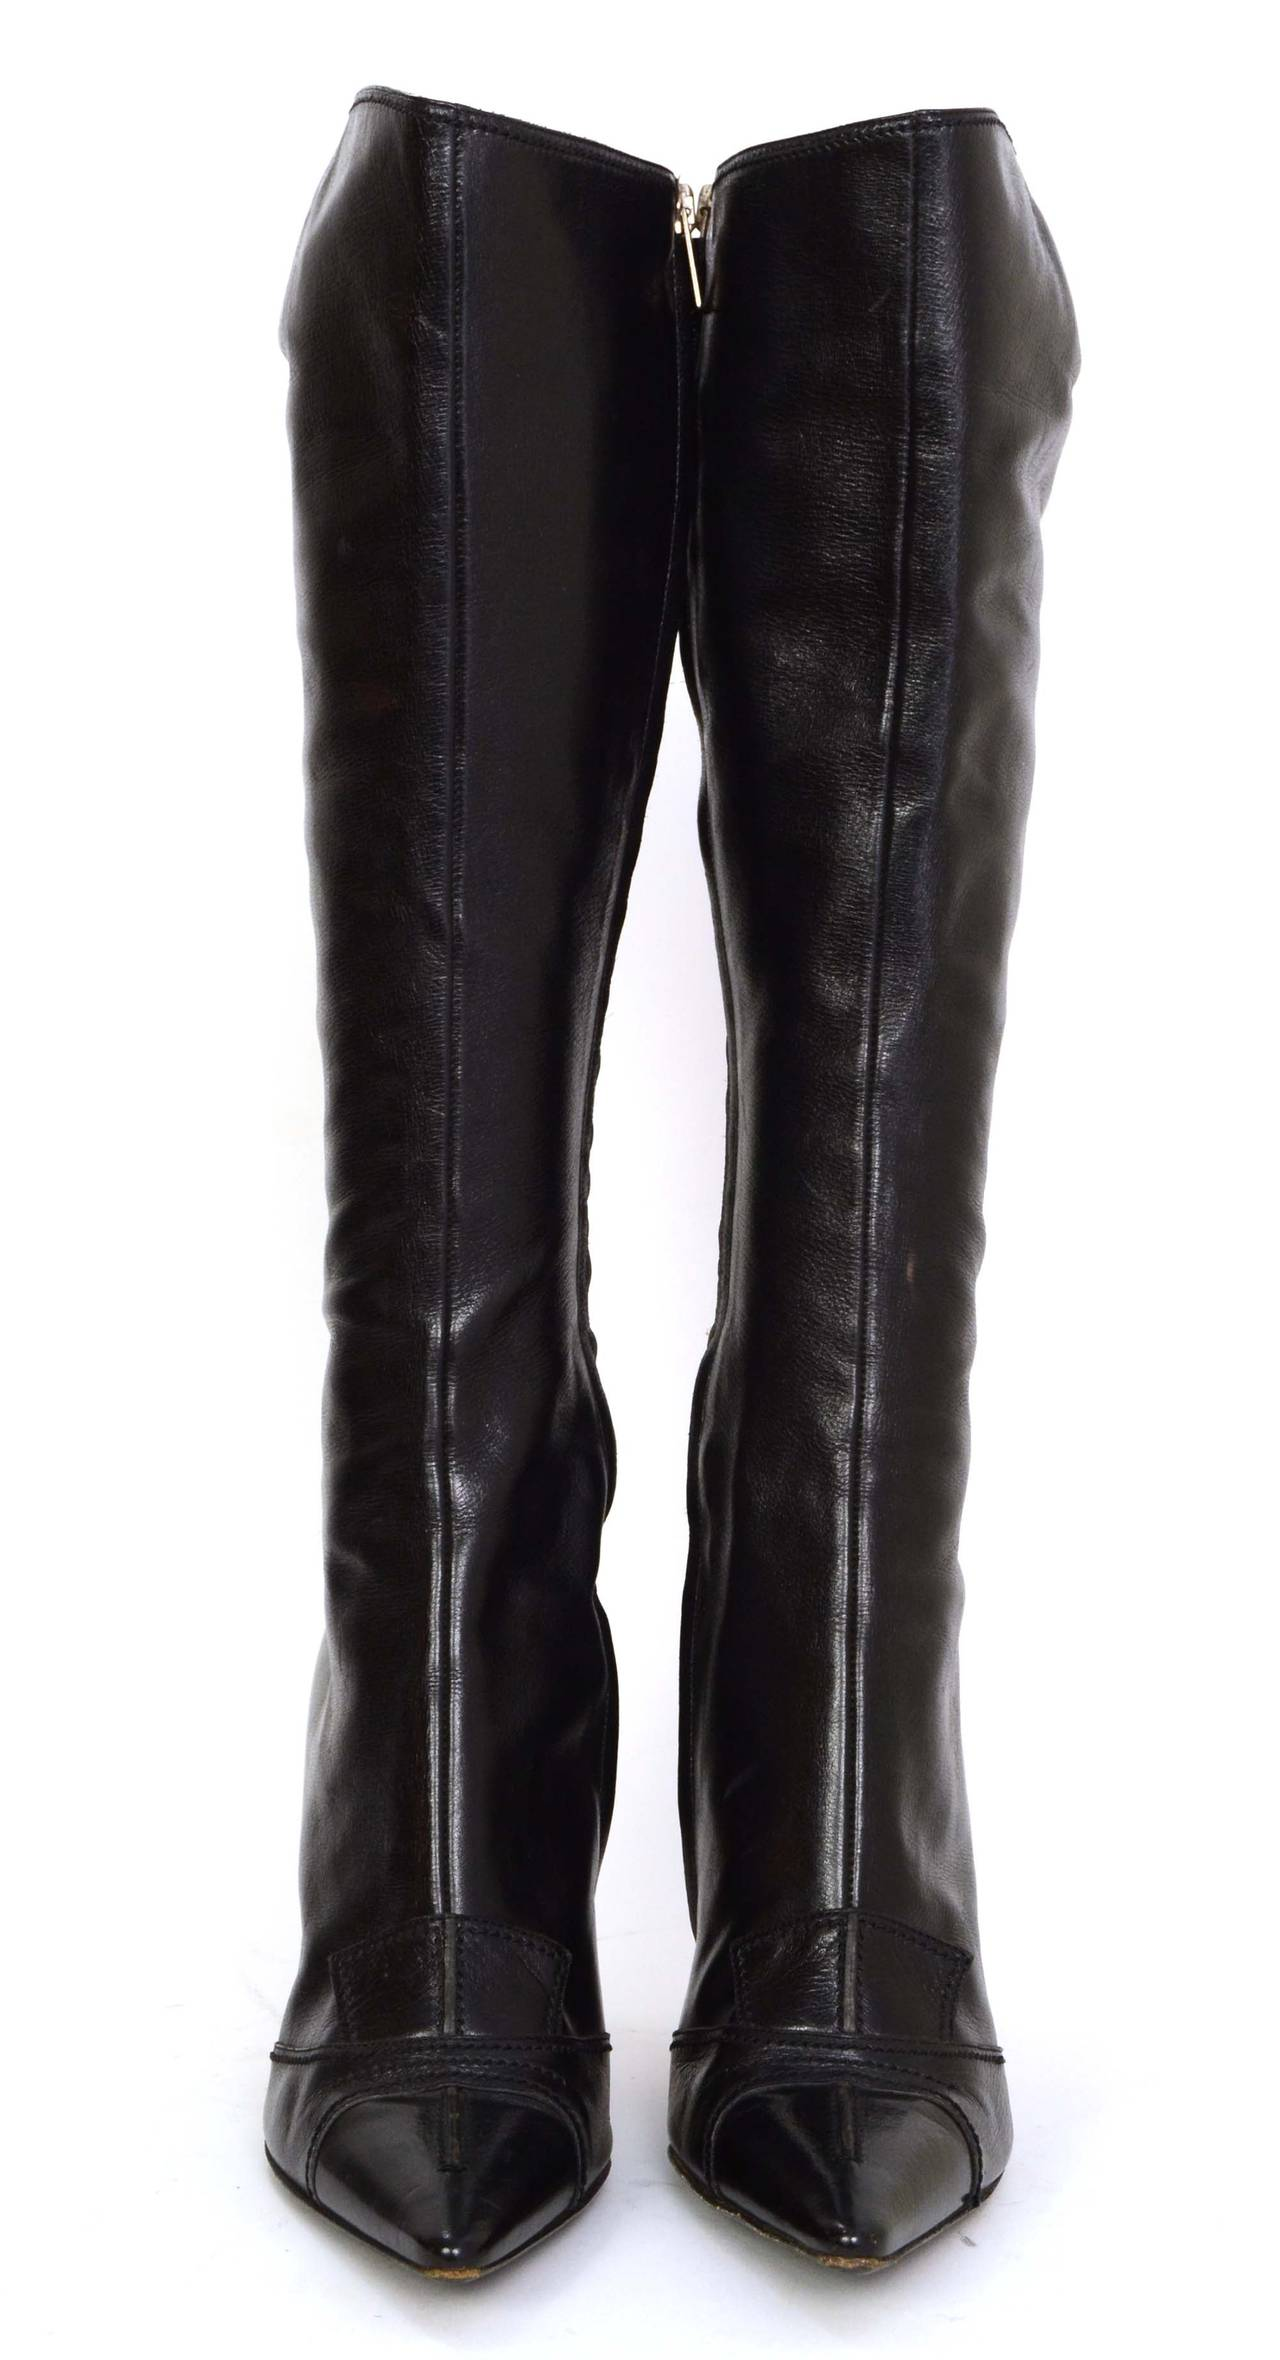 YVES SAINT LAURENT YSL Black Leather Tall Boots sz 37.5 2